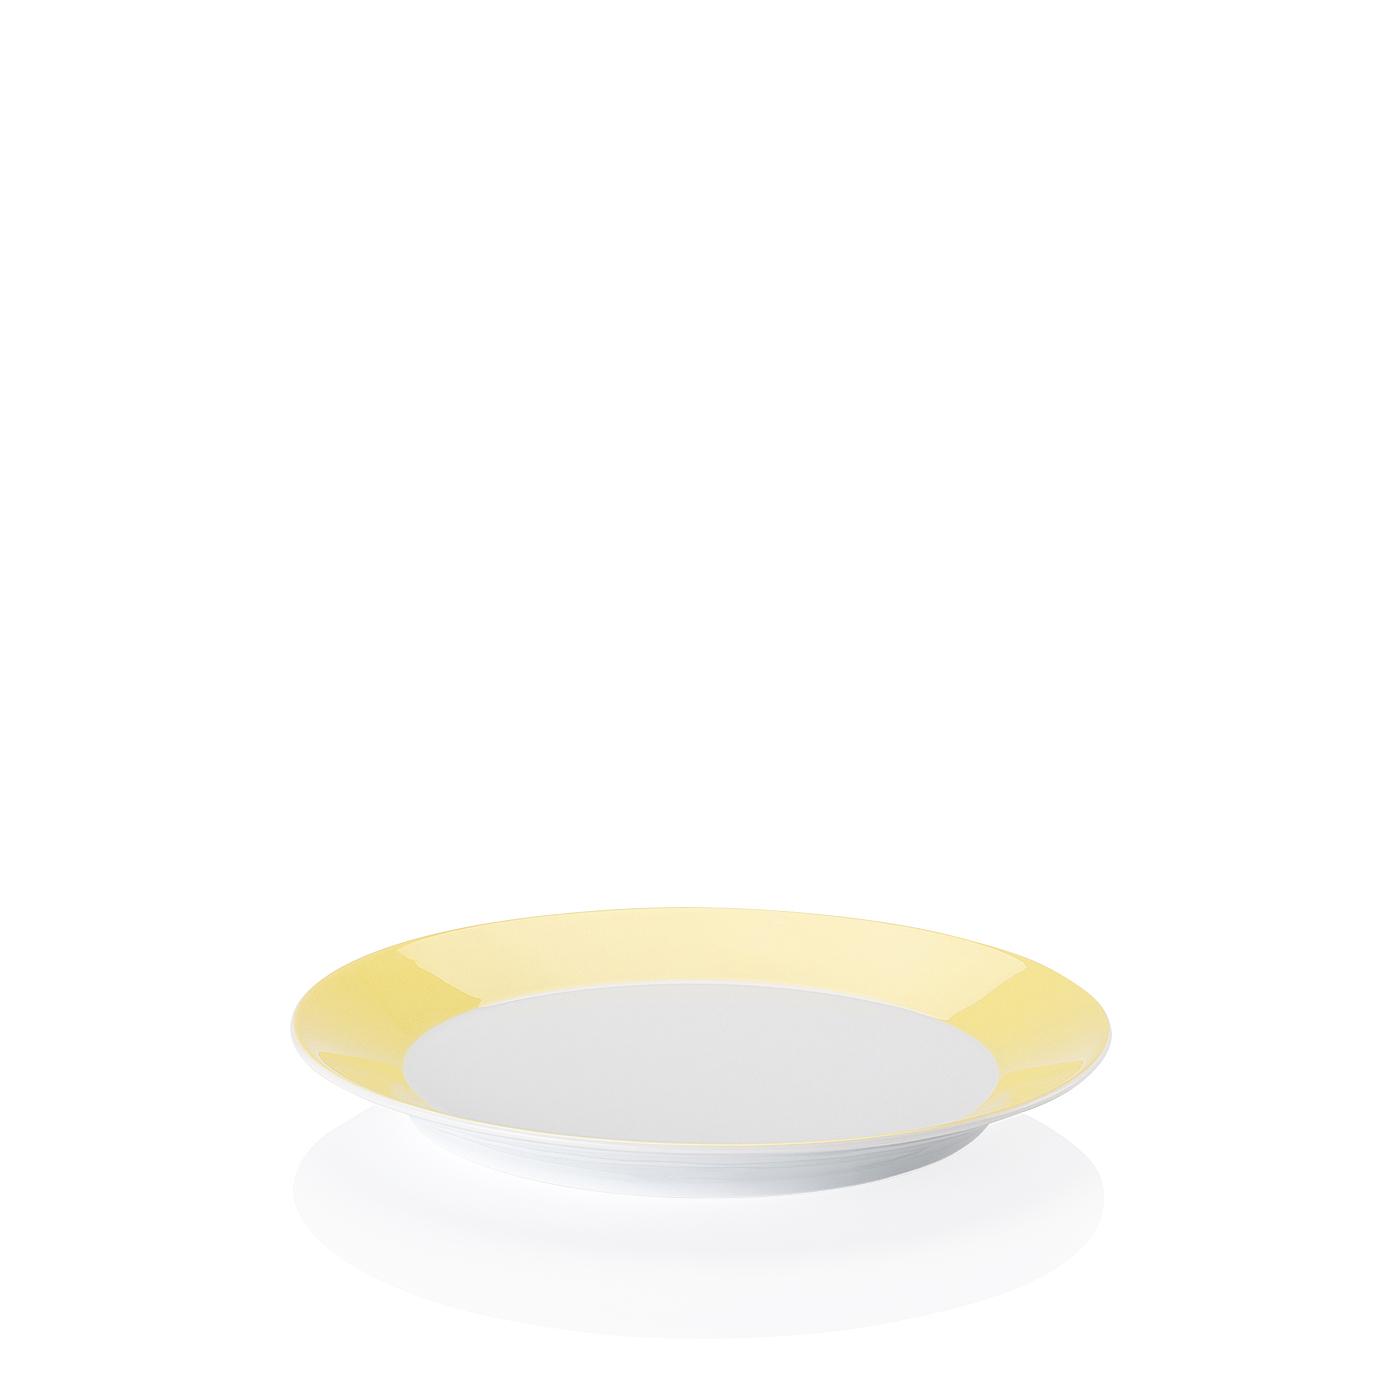 Frühstücksteller 22 cm/Fa Tric Gelb Arzberg